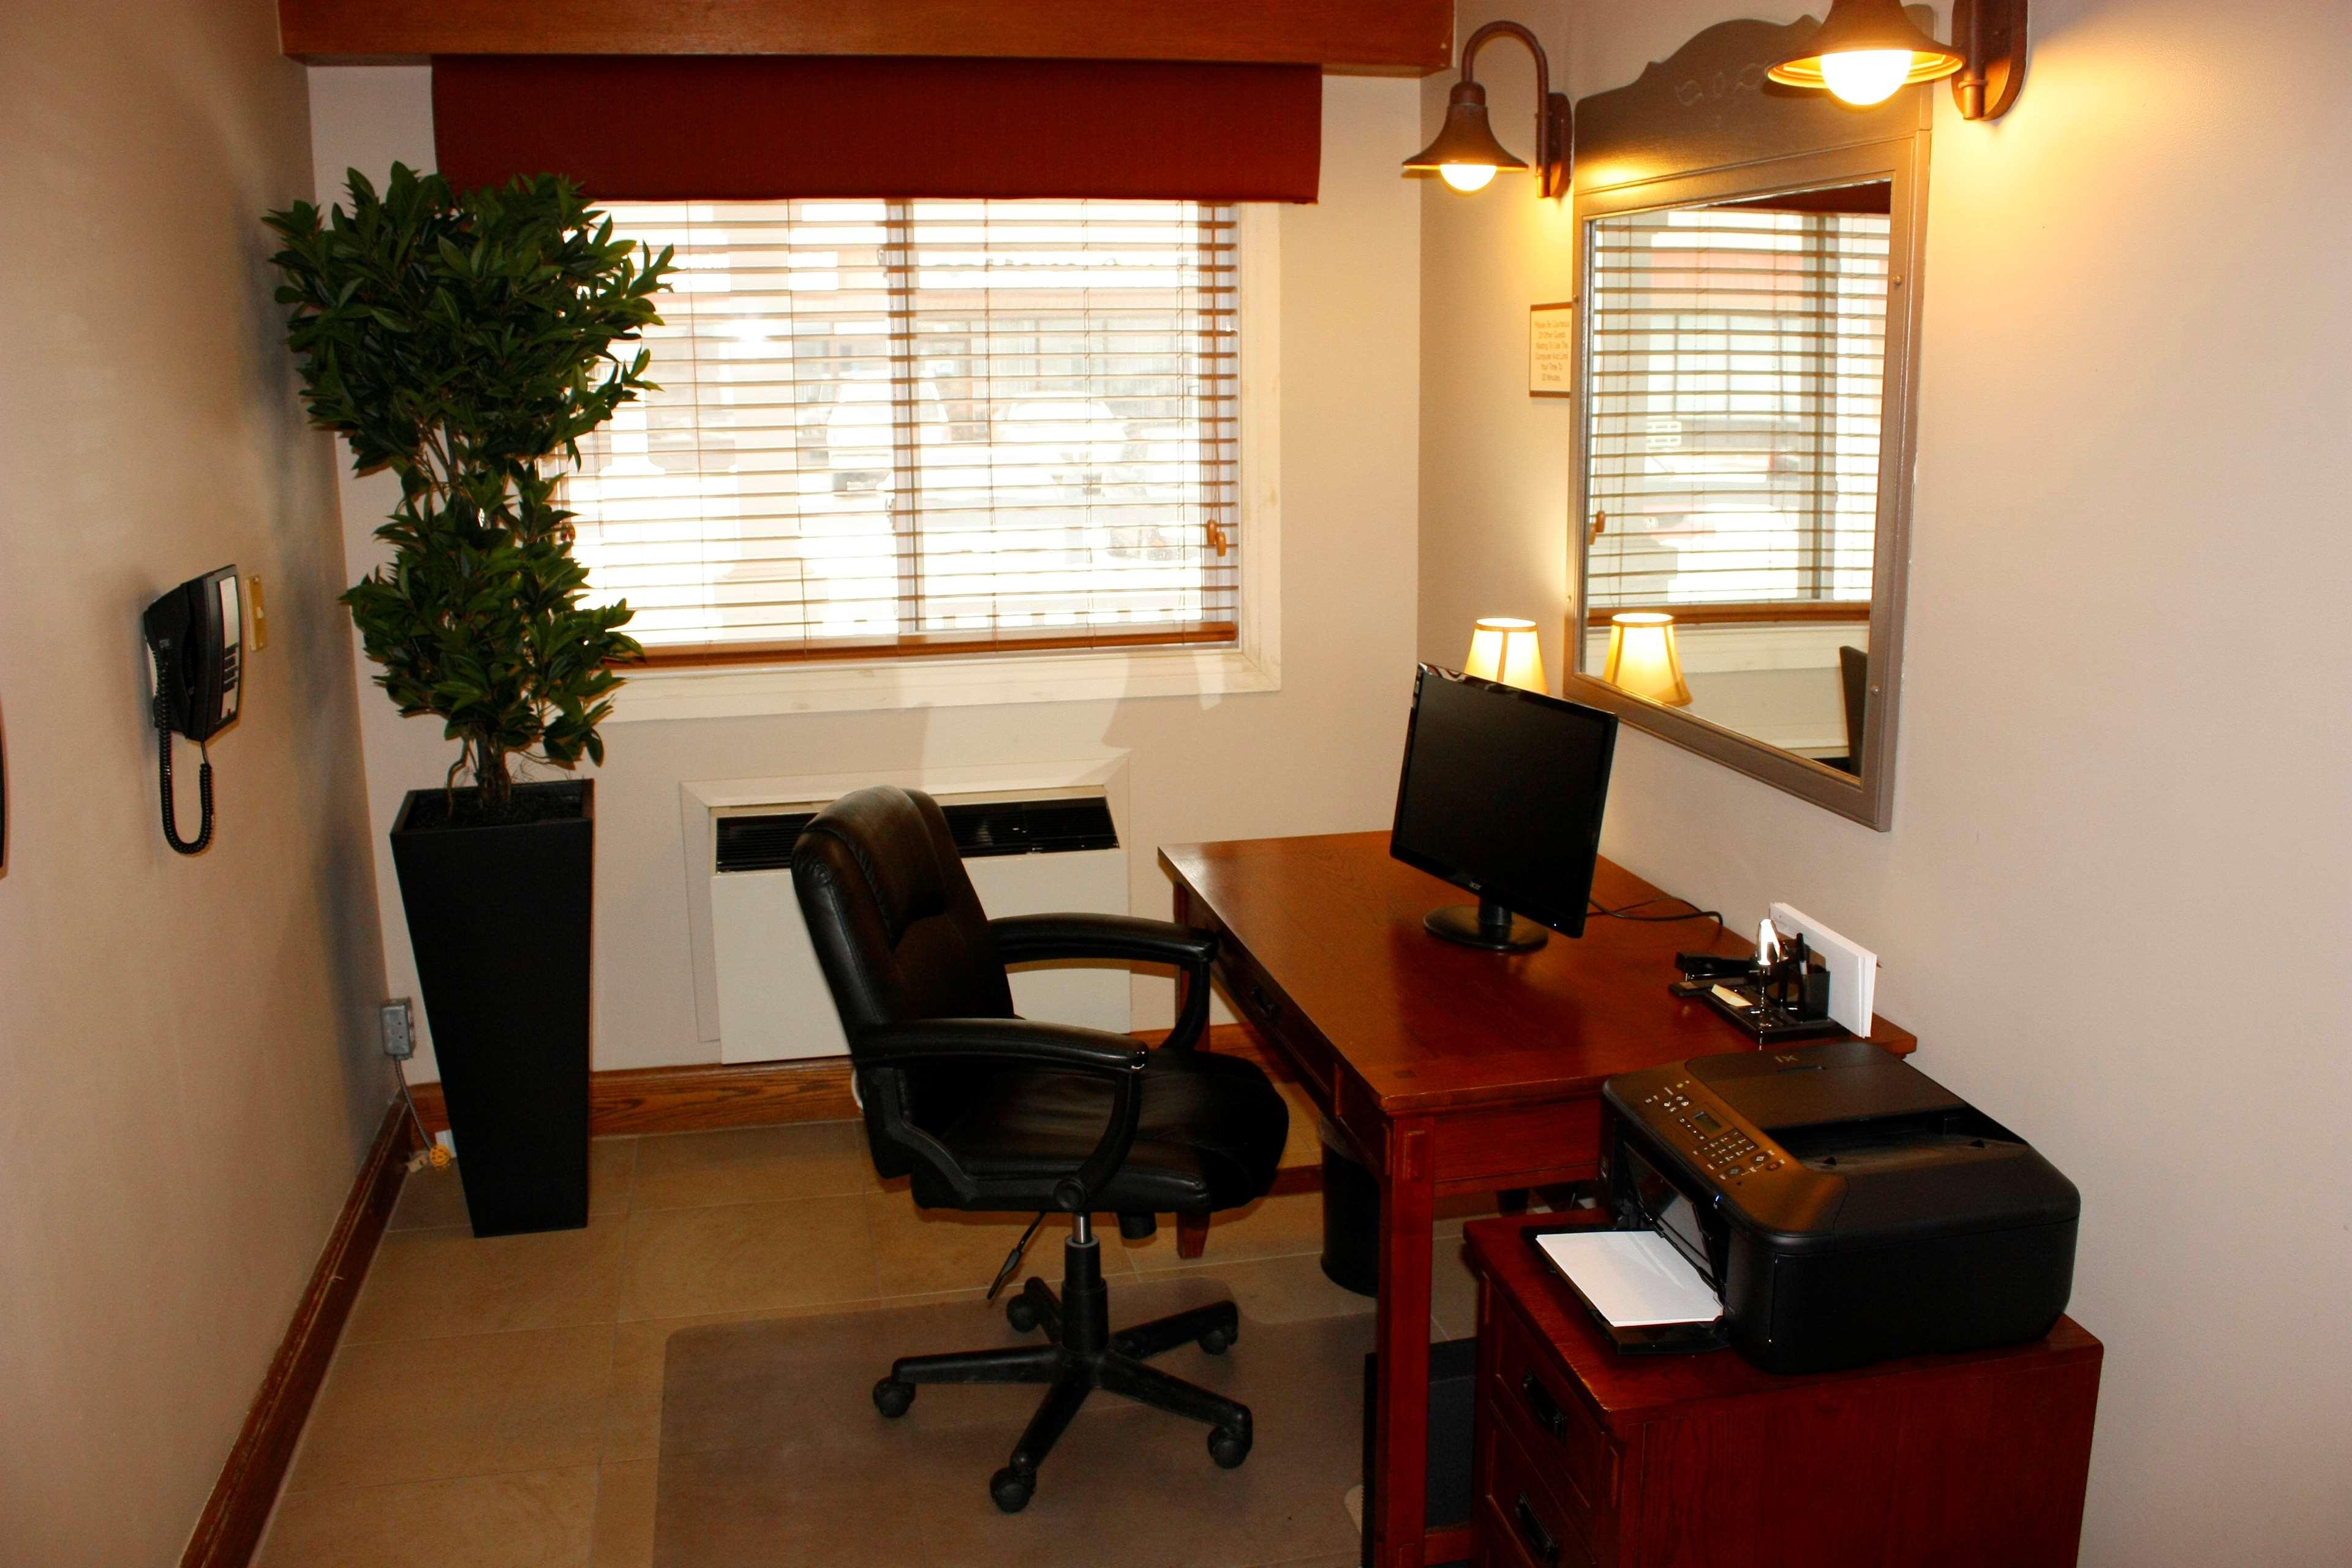 Country Inn & Suites by Radisson, Saskatoon, SK in Saskatoon: Business Centre